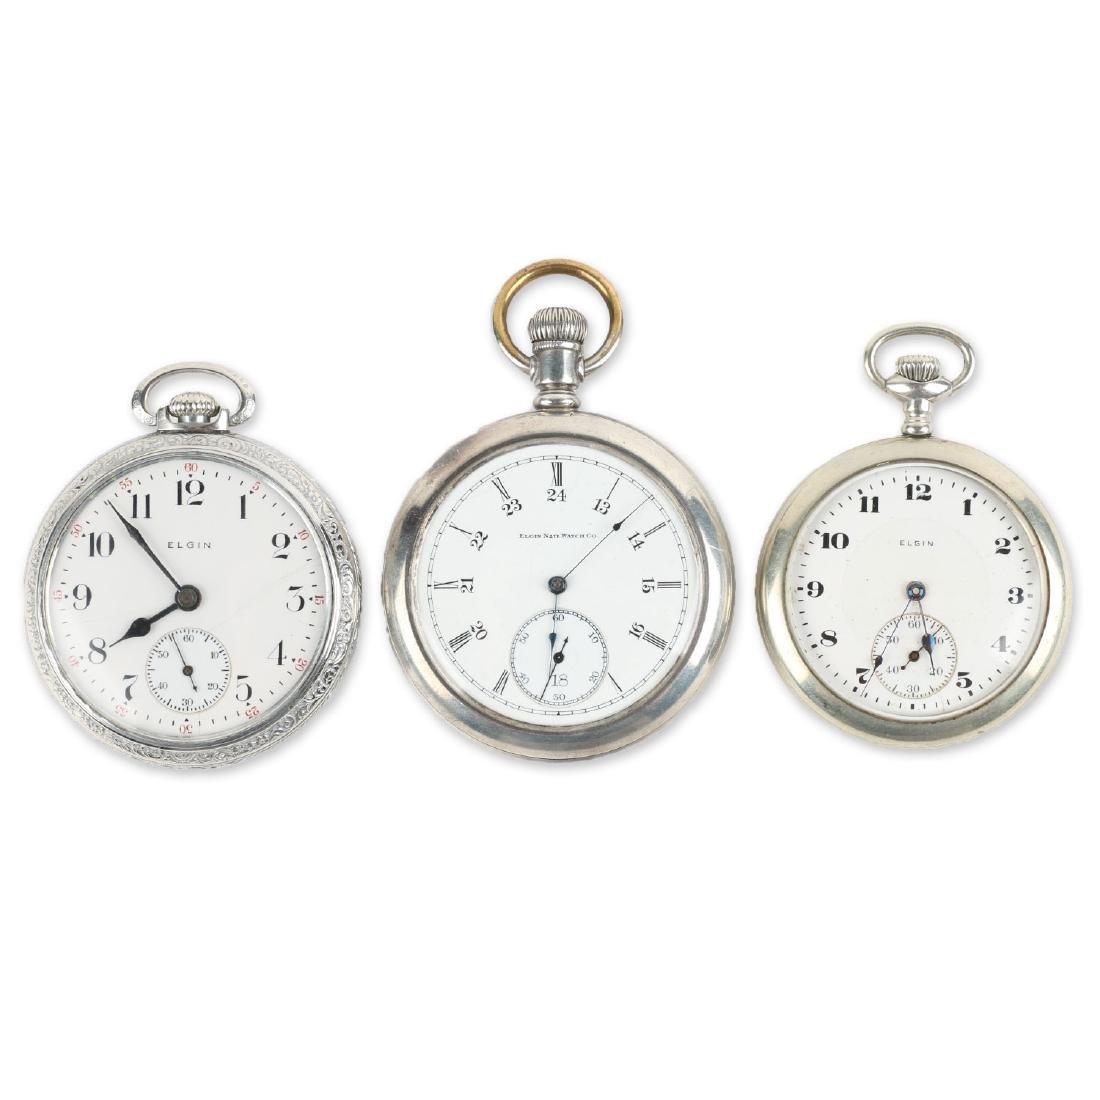 Three (3) 16S & 10S Elgin Pocket Watches